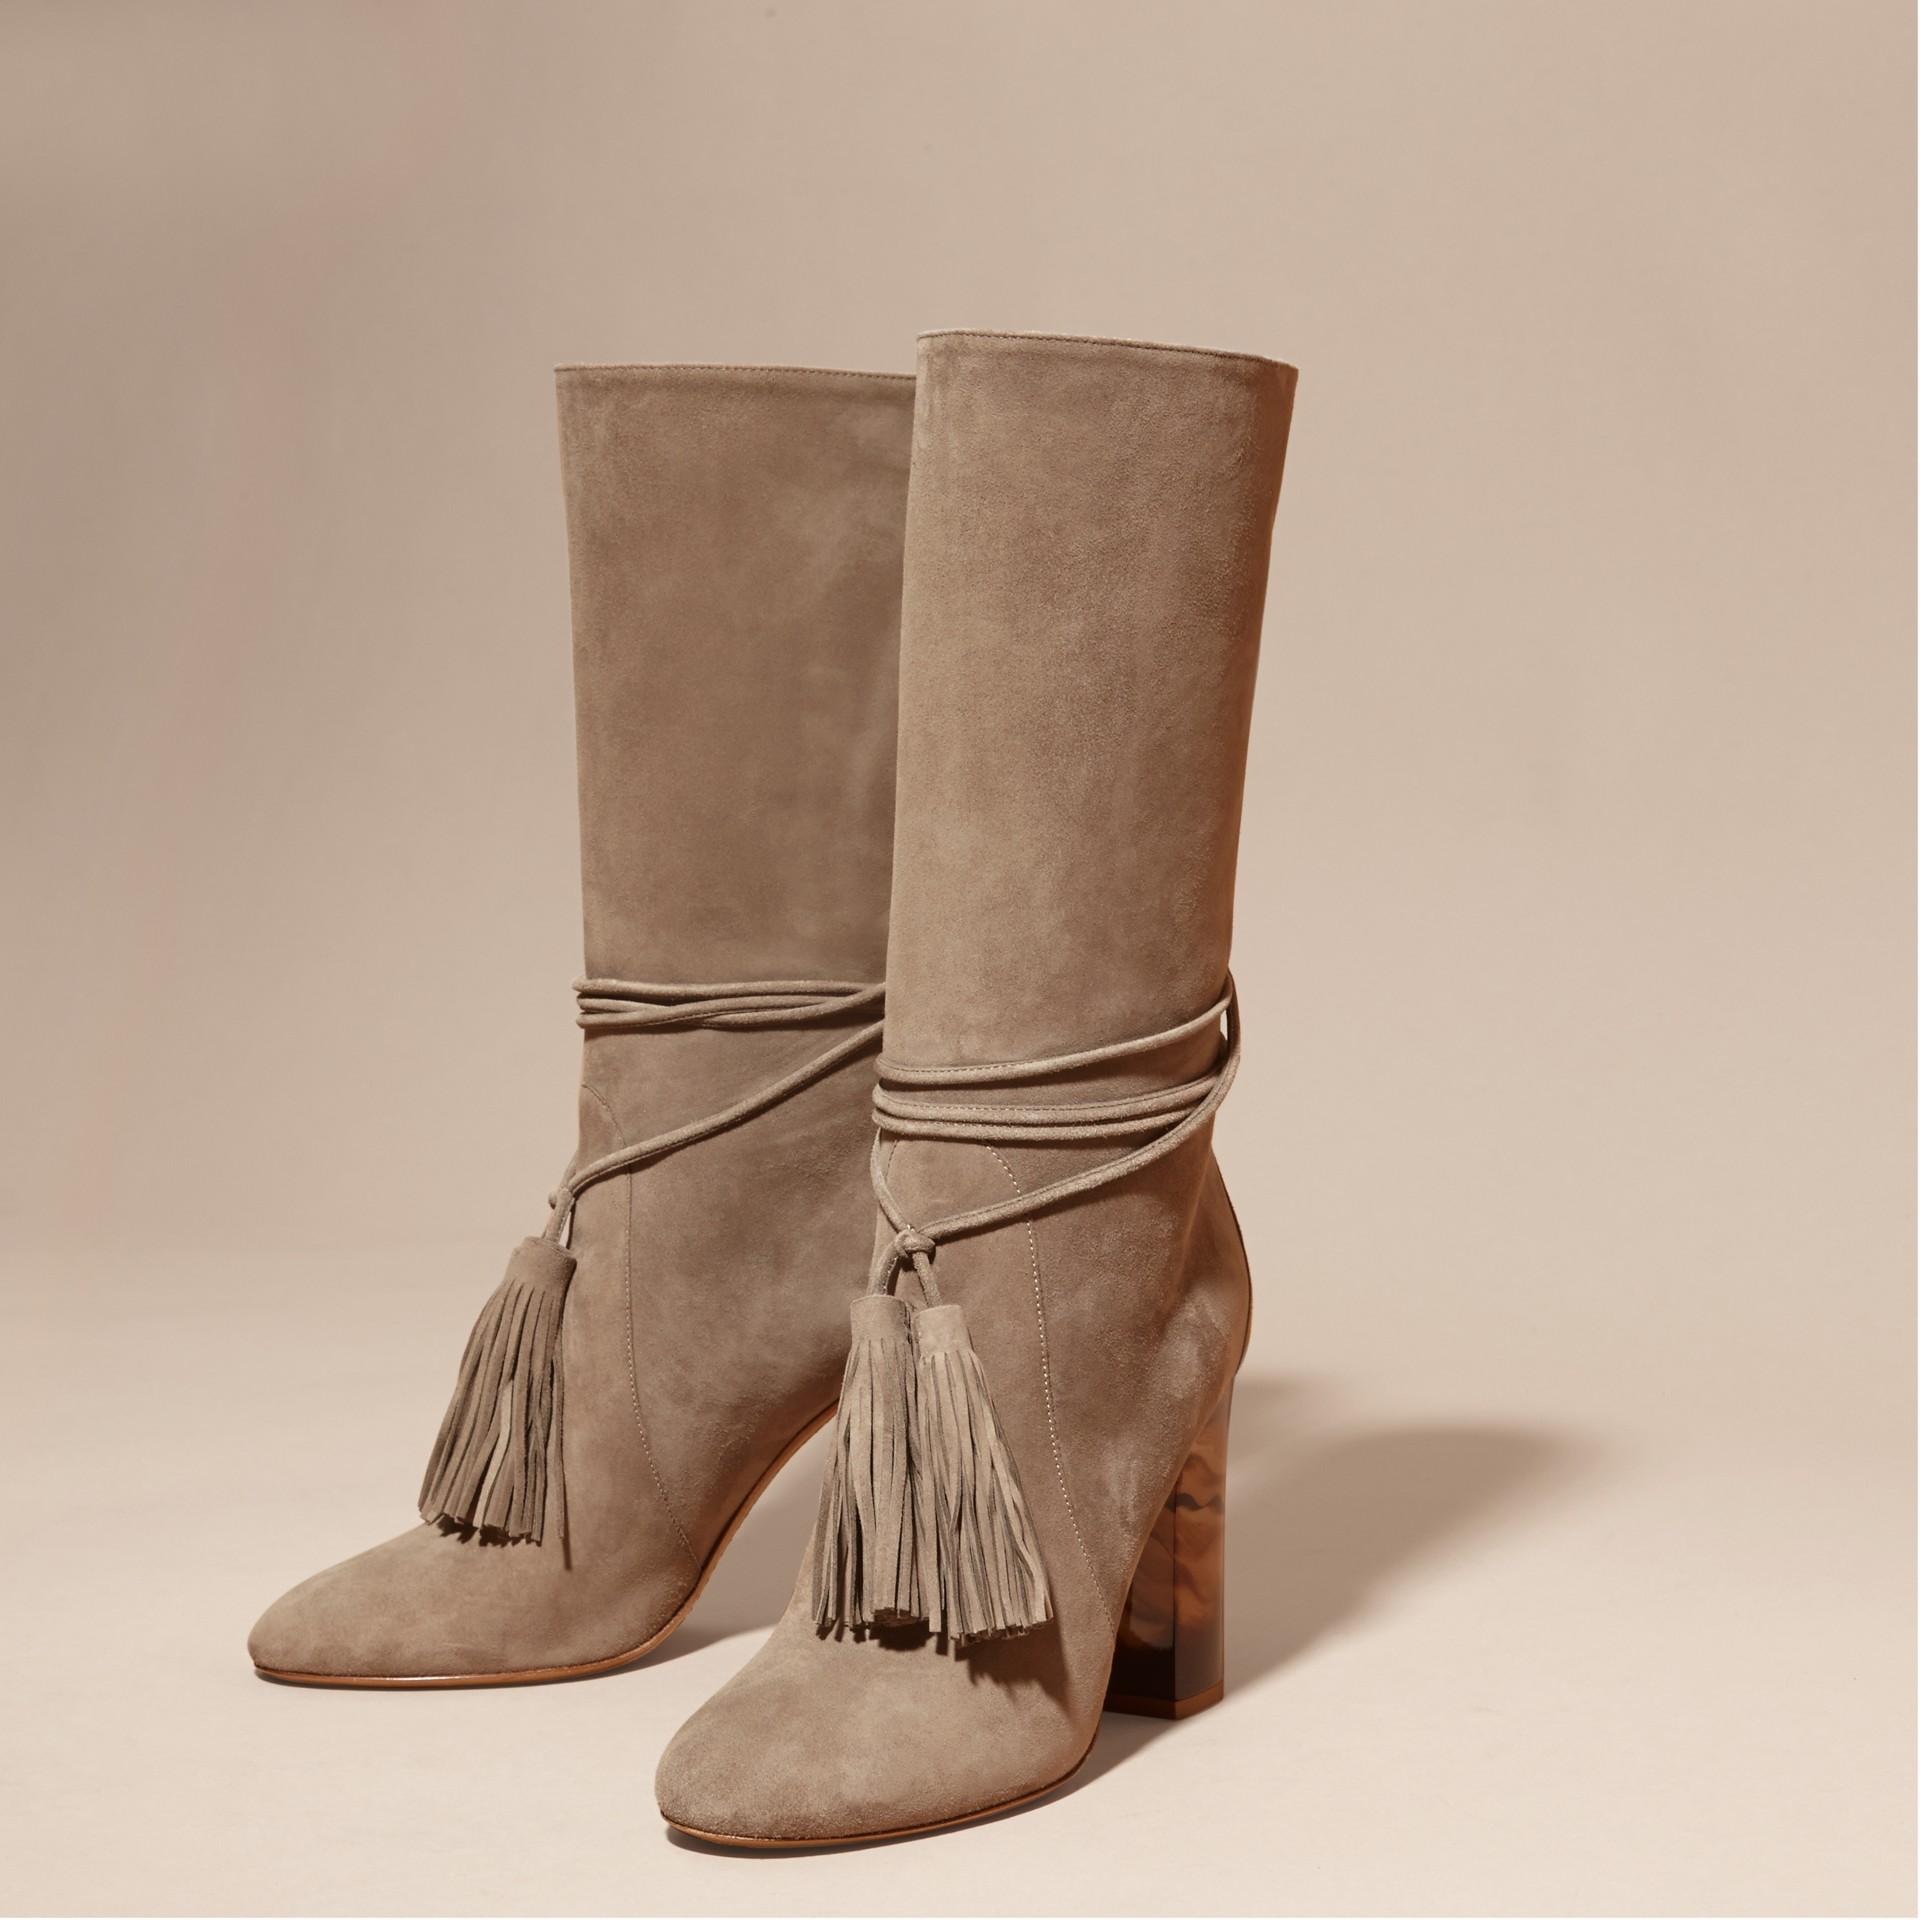 Dark heather melange Tasselled Suede Pull-on Boots - gallery image 3